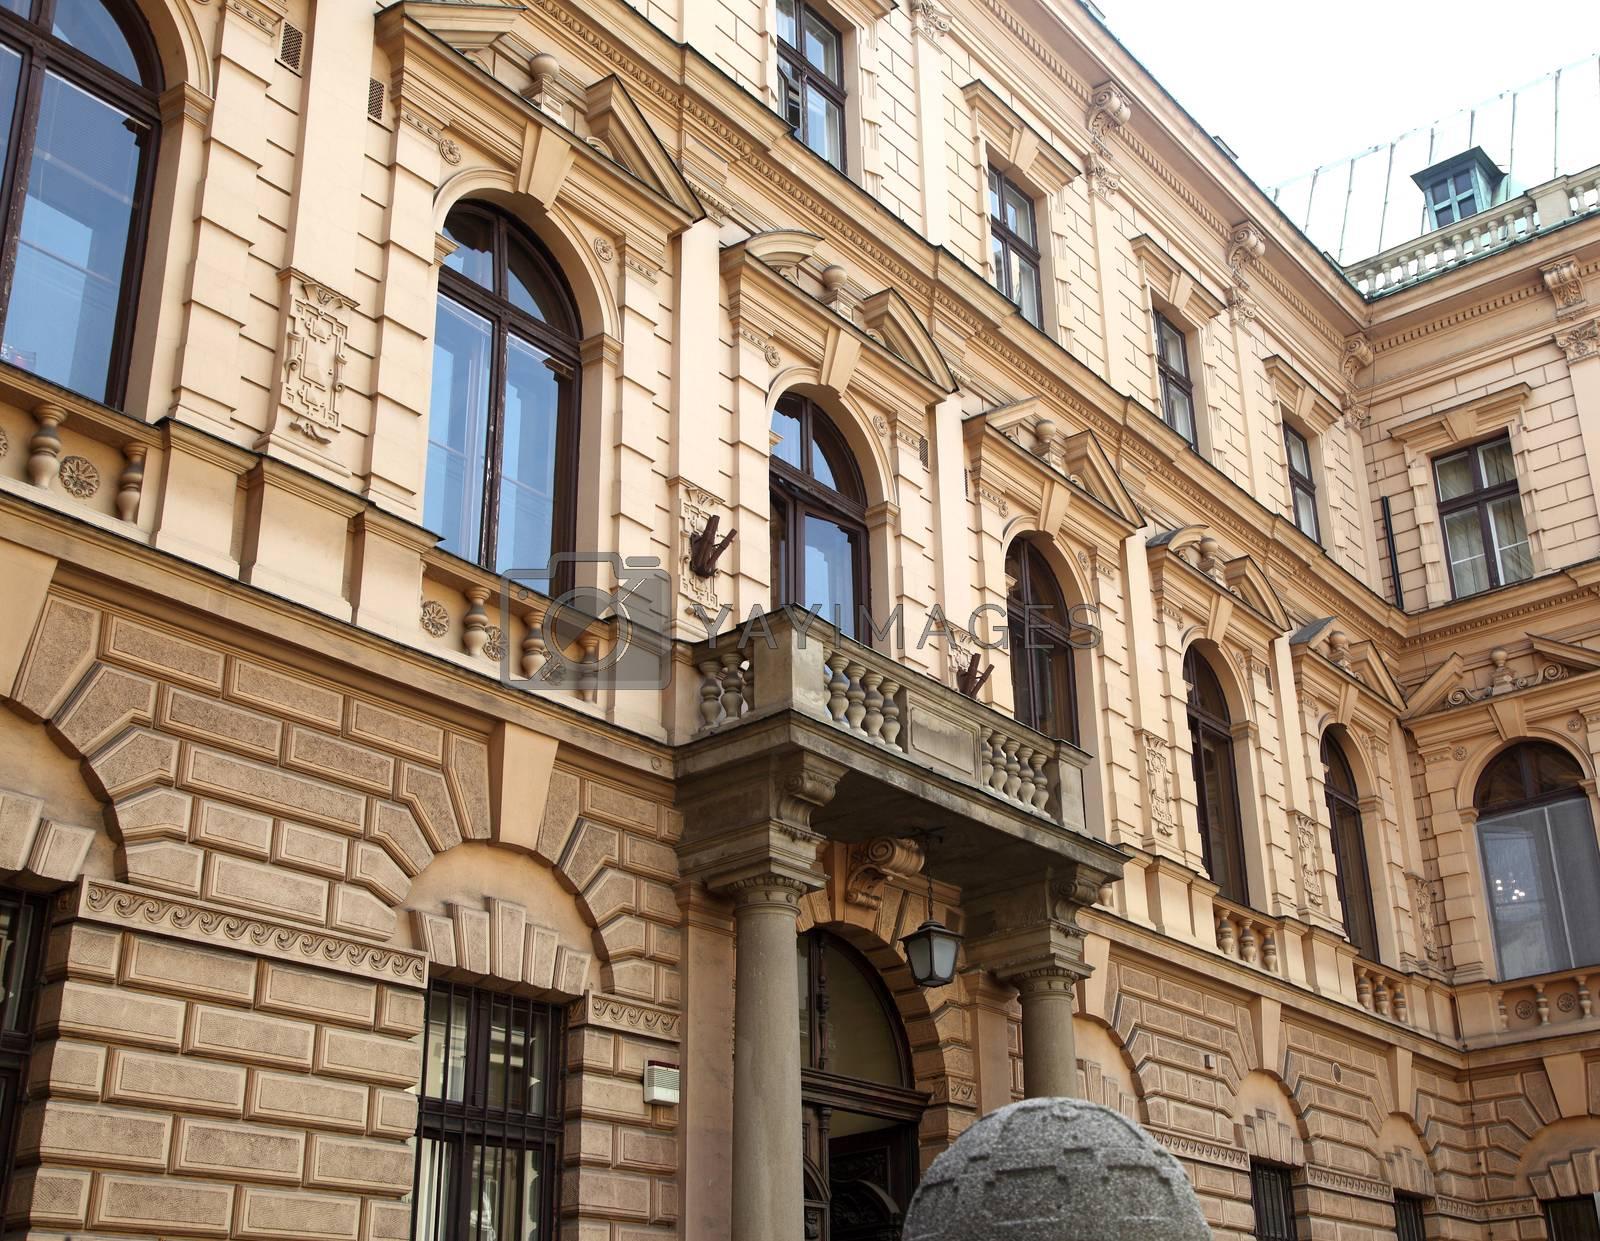 old building in Krakow by sagasan